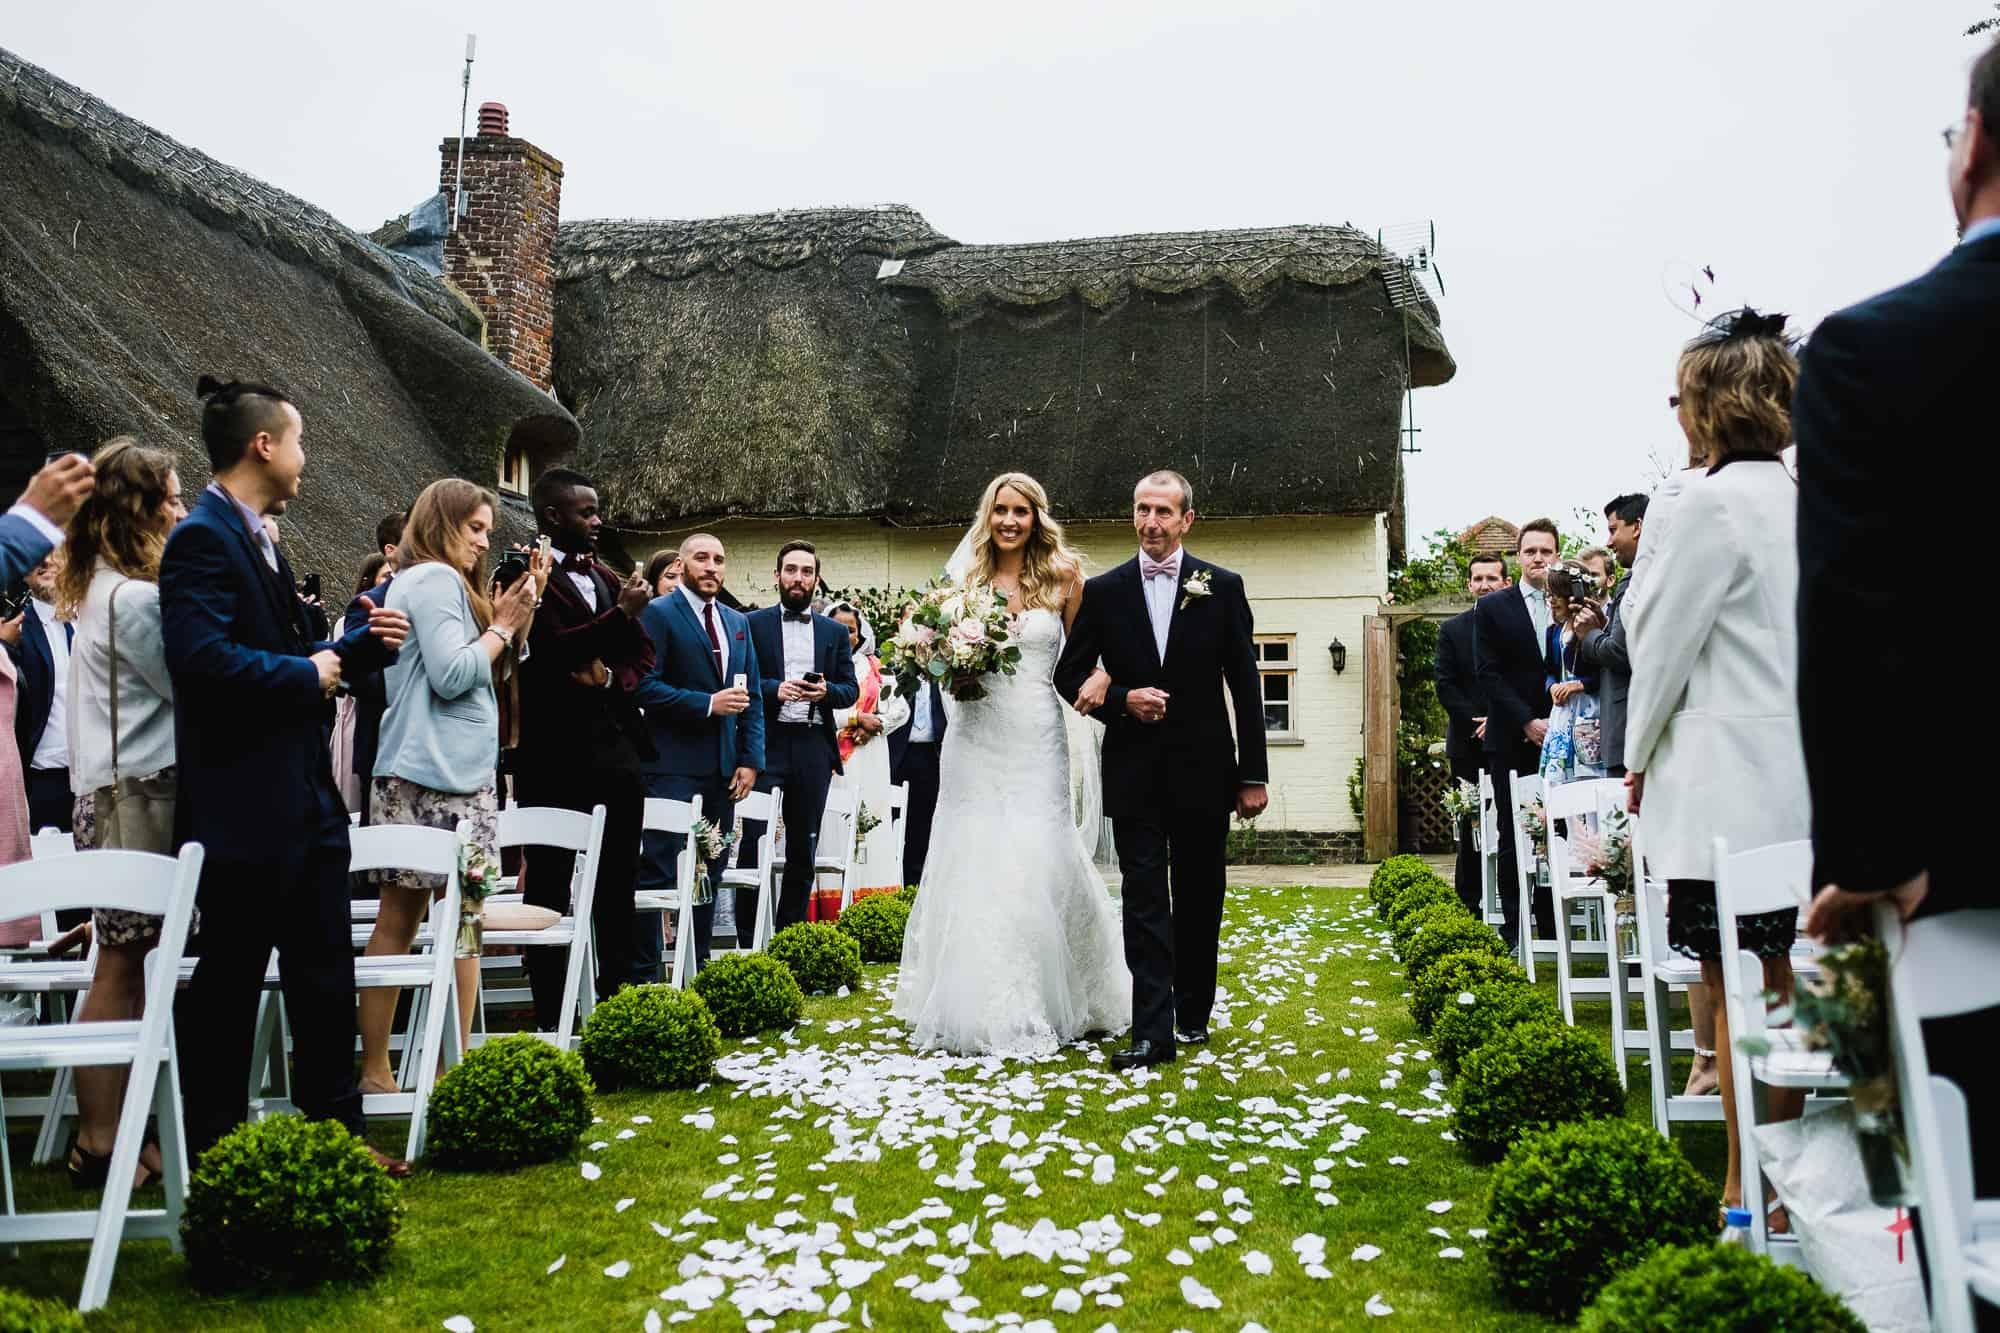 marleybrook-house-wedding-photography-matt-tyler-0024